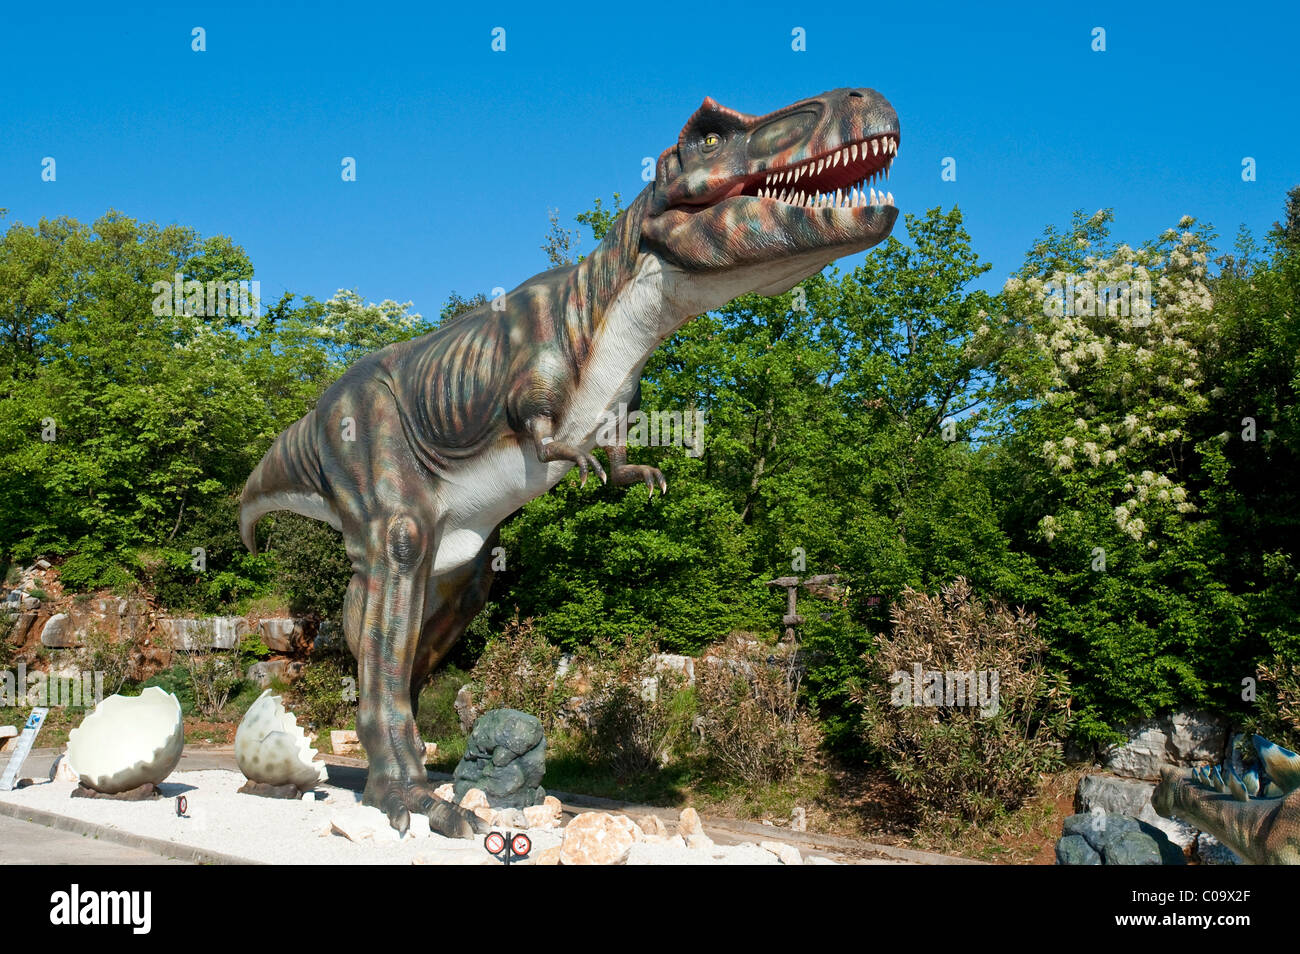 Funtana dinosaur park, Istria, Croatia, Europe - Stock Image